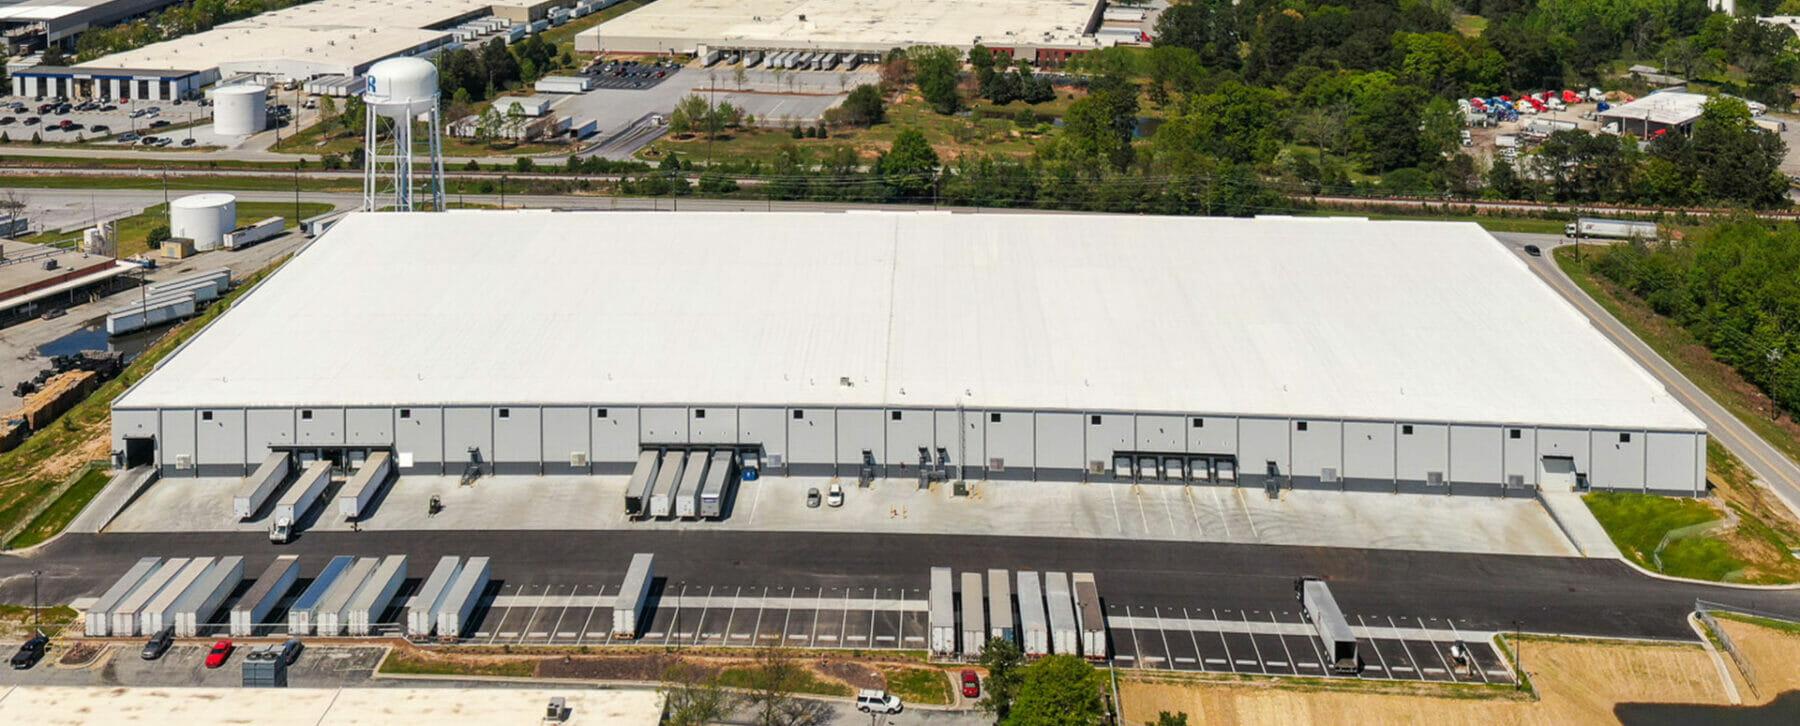 BioLab Warehouse - Conyers, GA 3